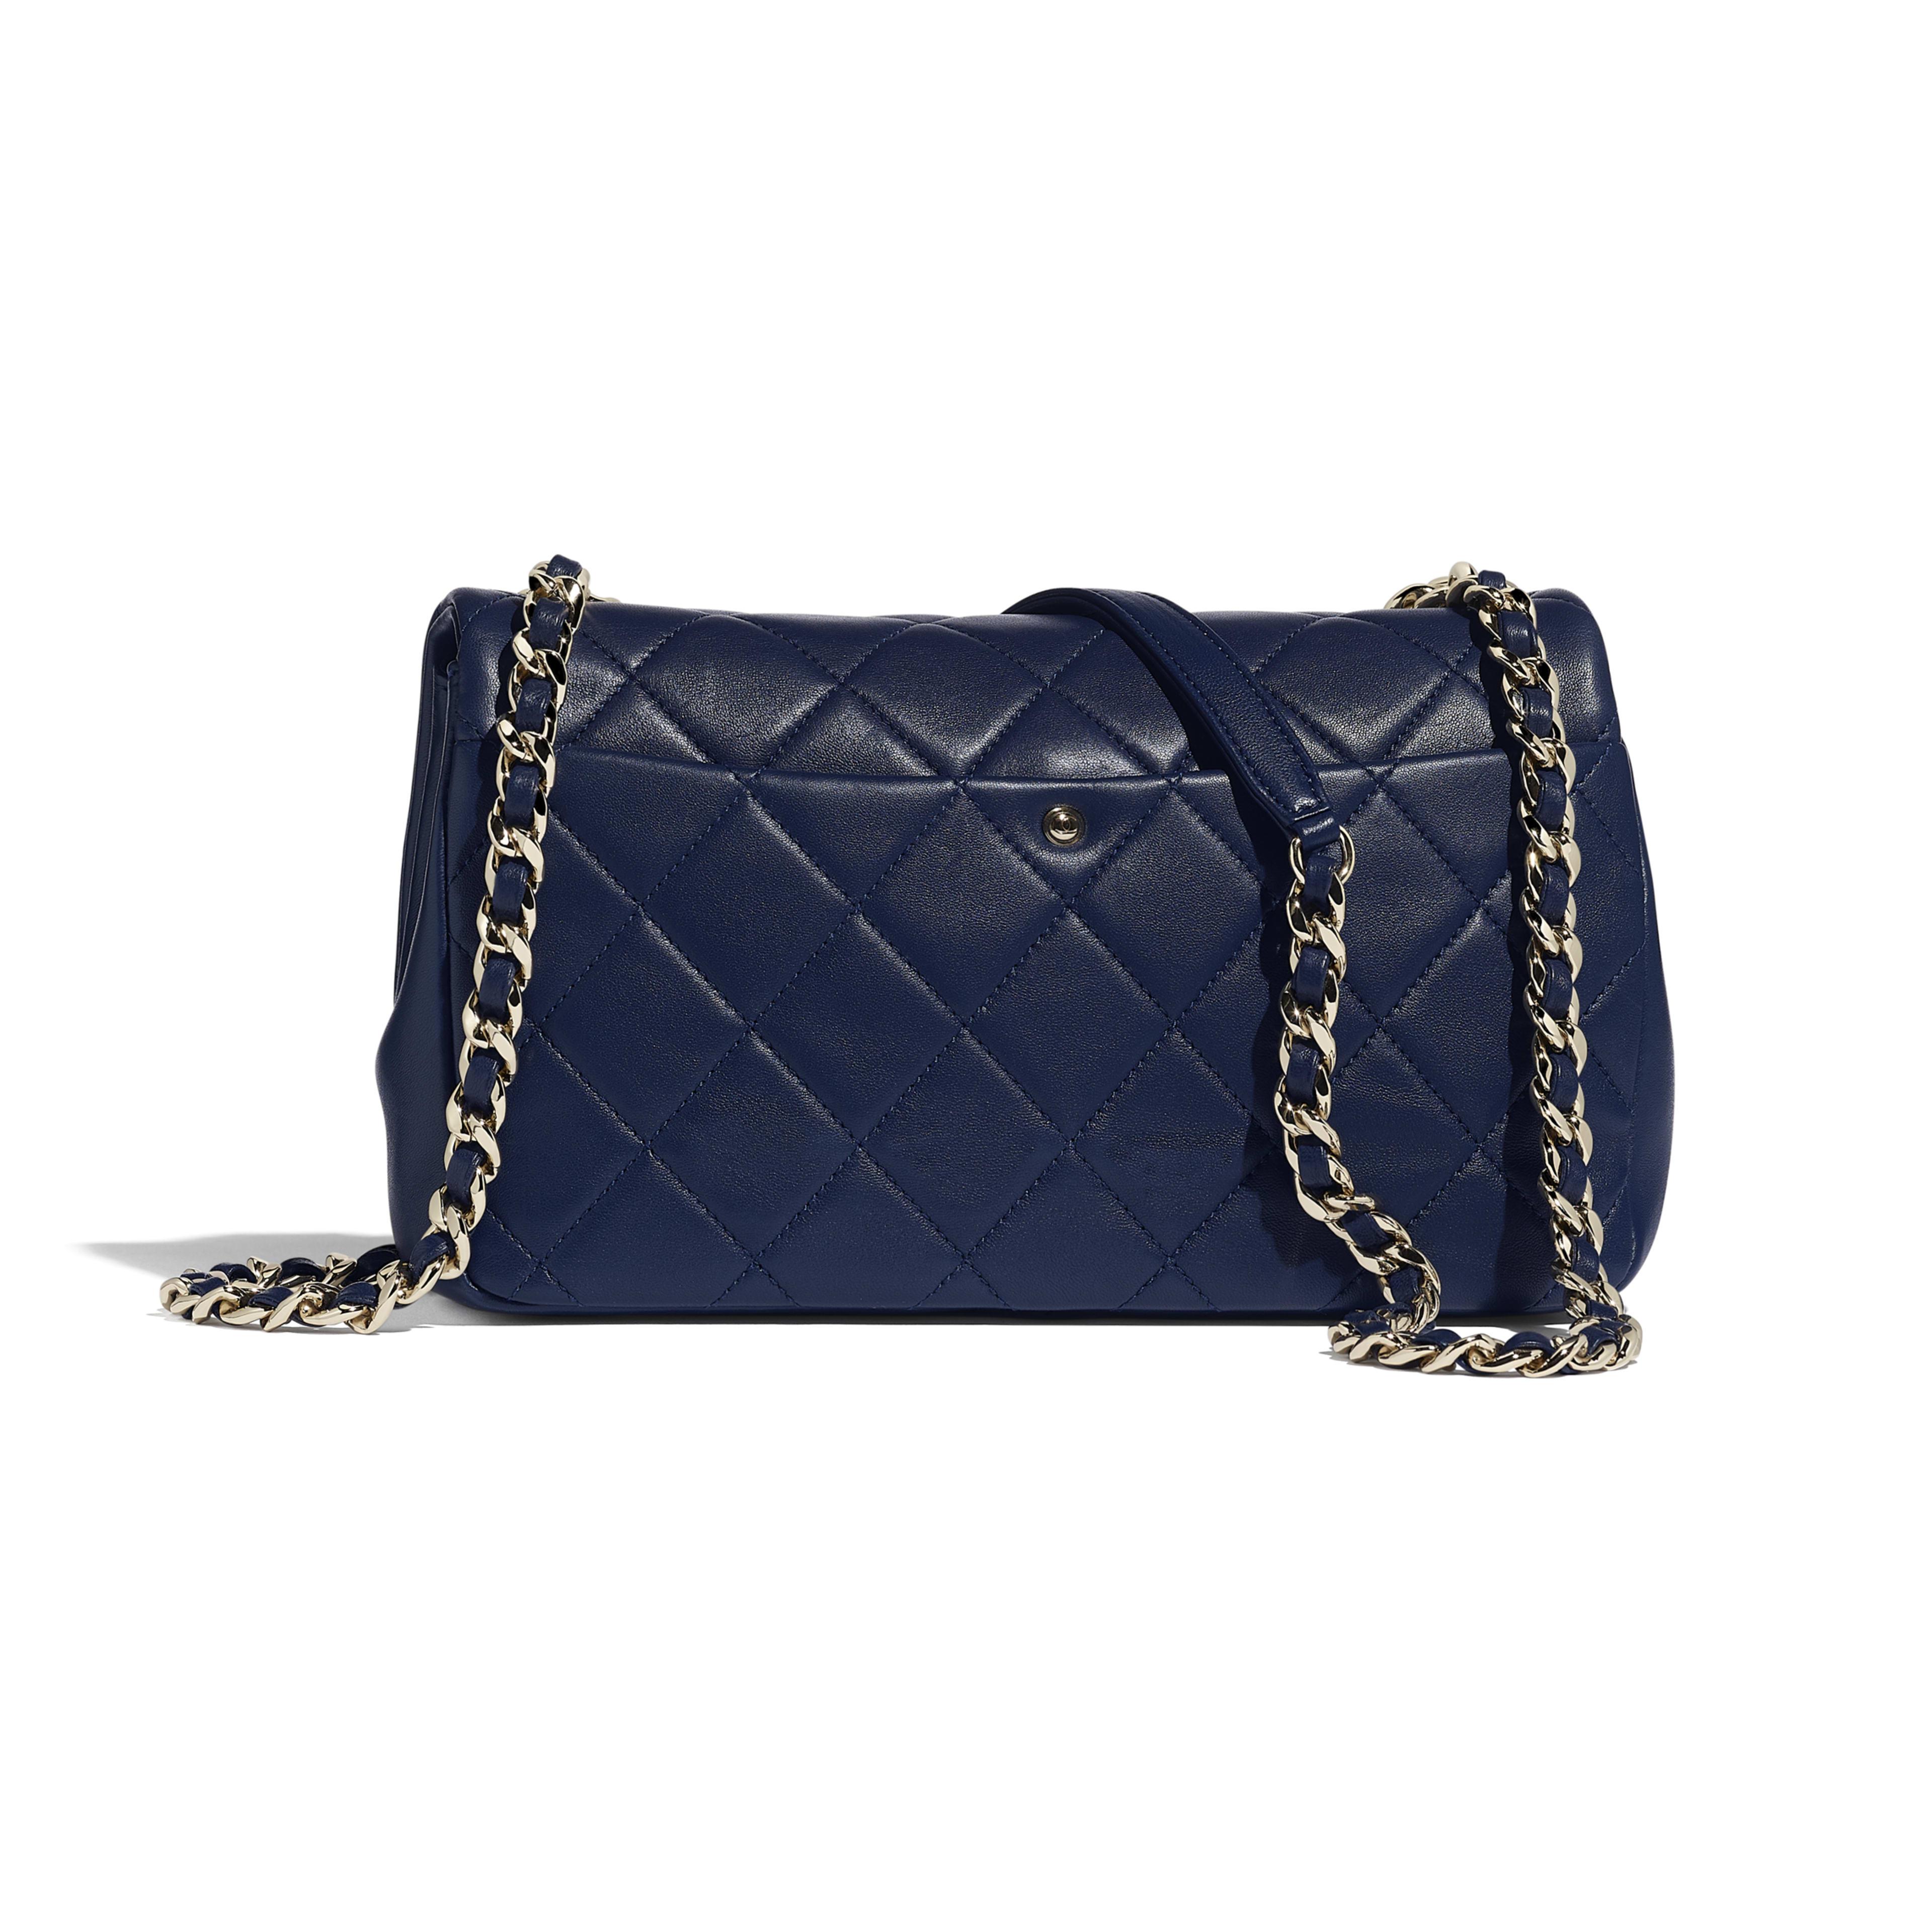 Lambskin Resin Gold Tone Metal Navy Blue Large Flap Bag Chanel